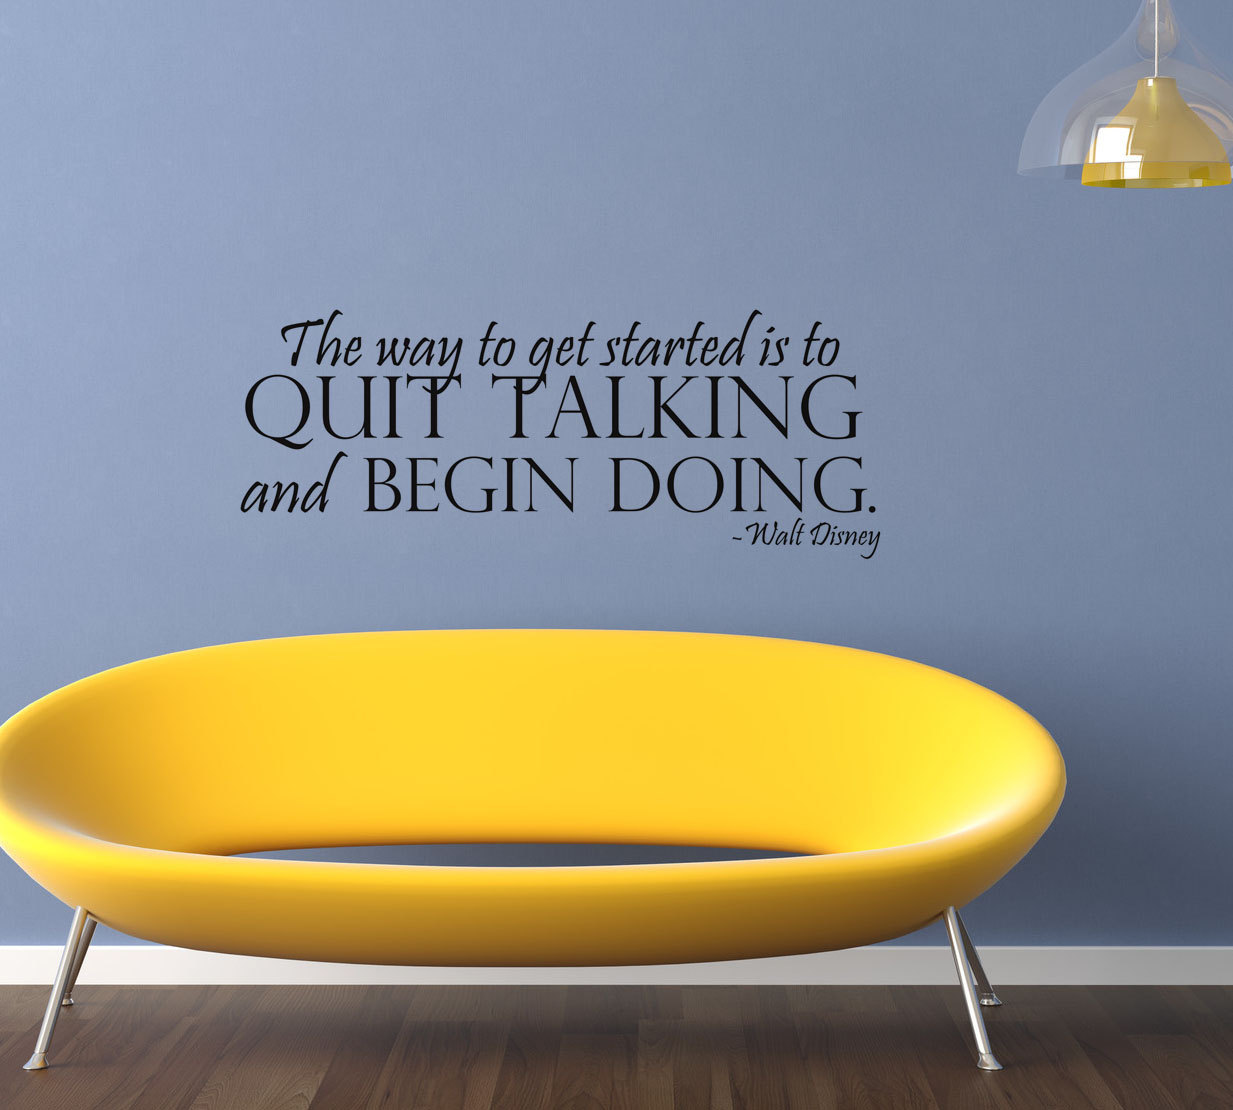 Walt Disney Quotes Wallpaper. QuotesGram